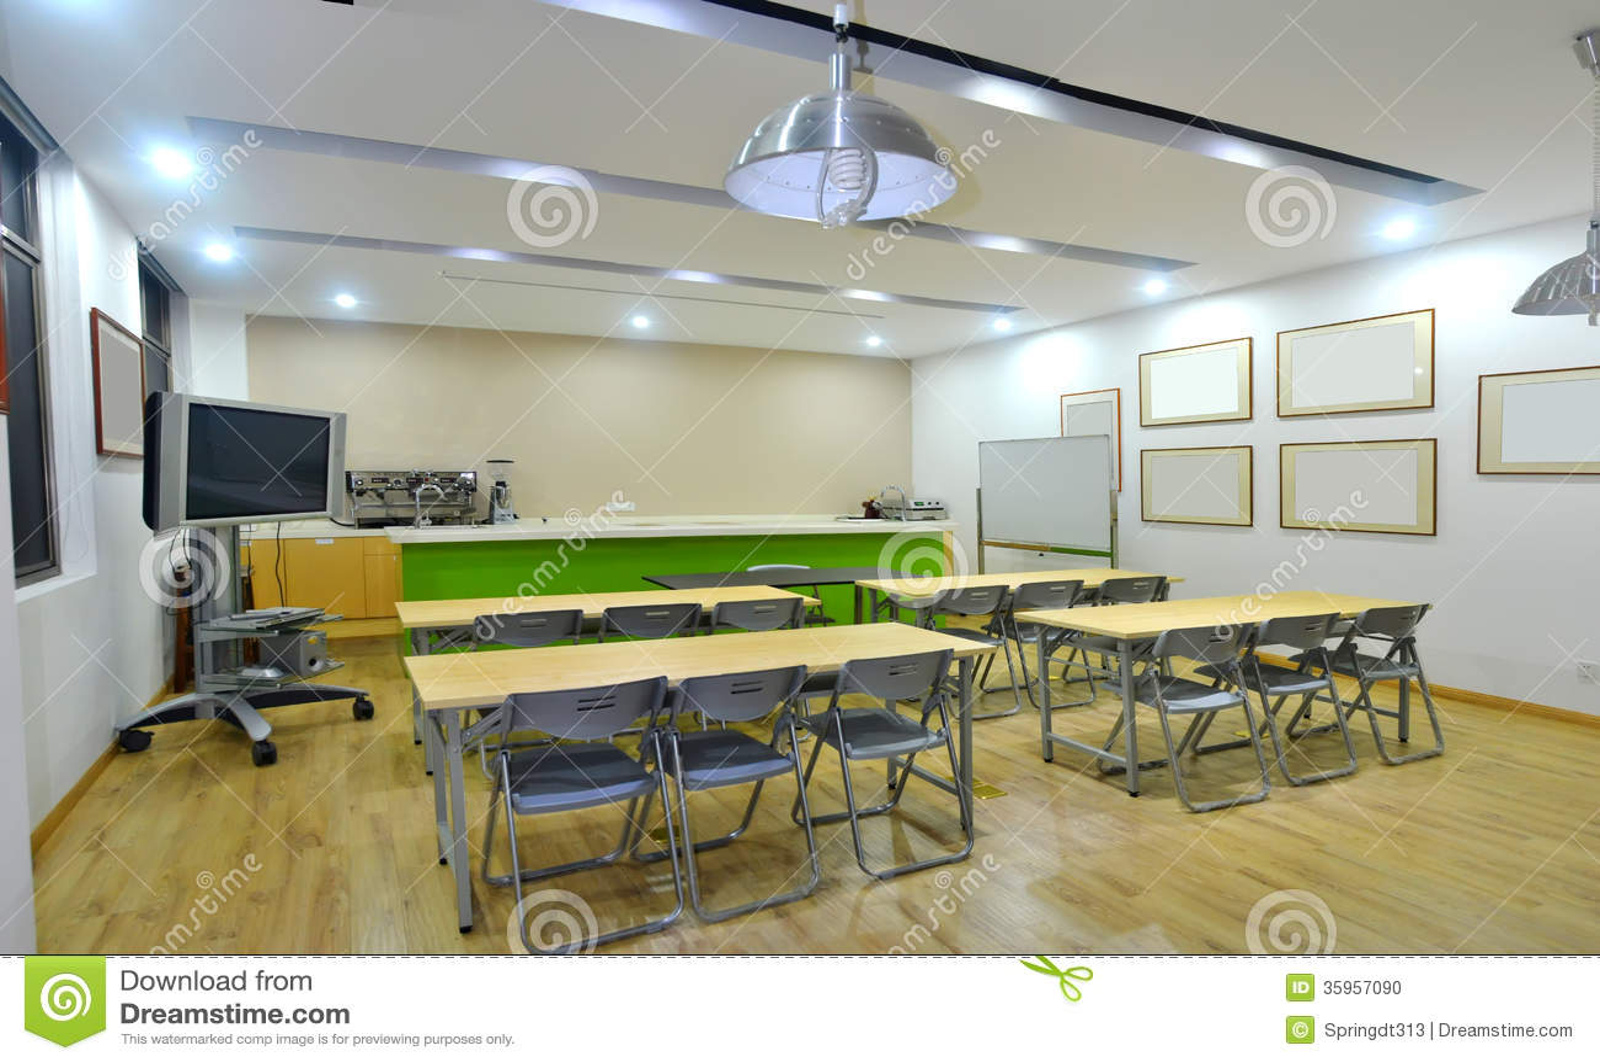 Training Room Classroom Stock Photo Image 35957090